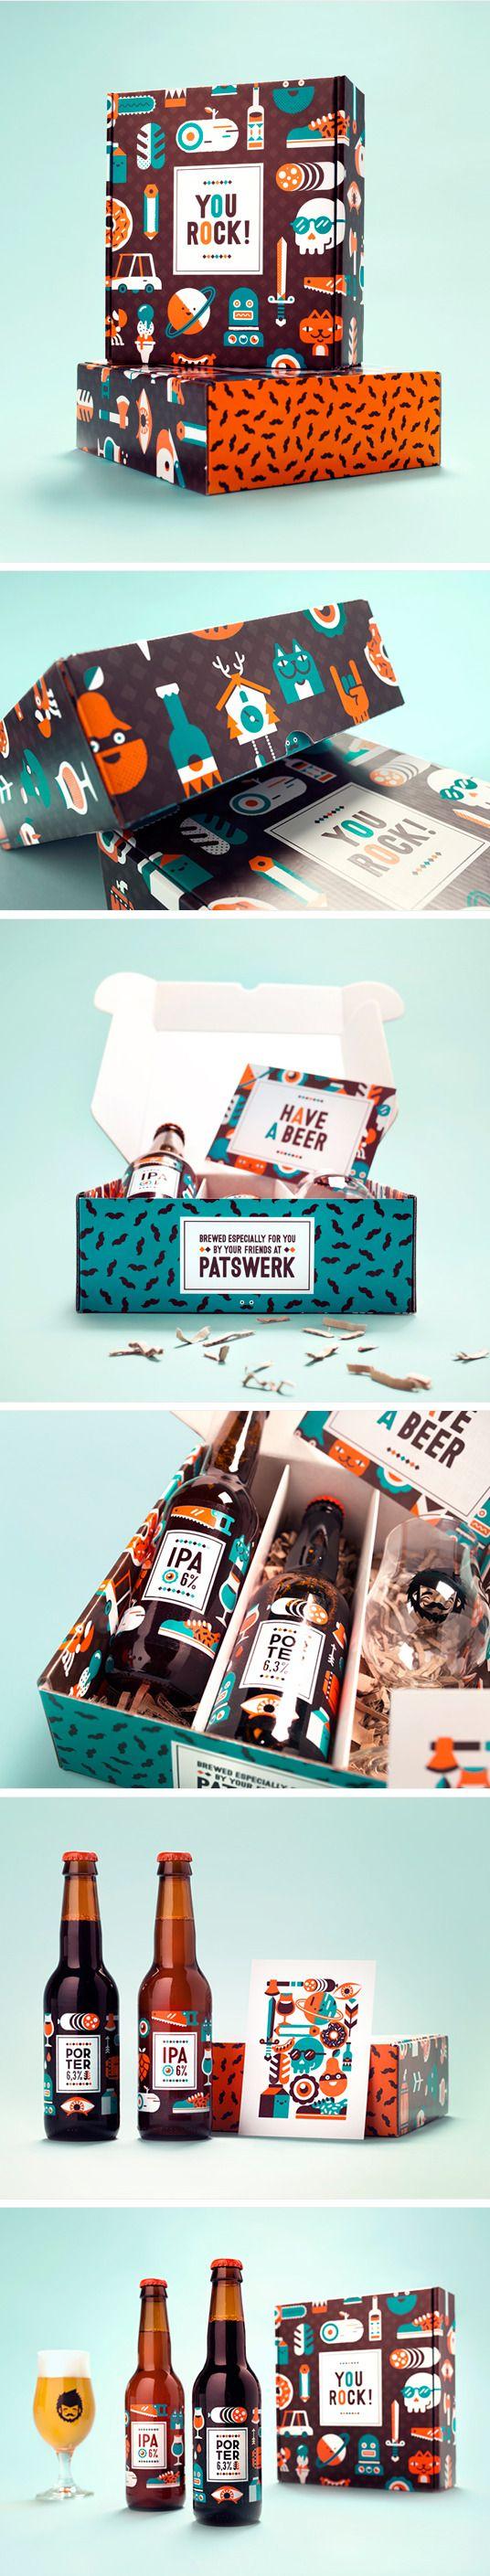 Patswerk Anniversary Beer. Sounds like 'password' to me. #packaging #bottle #design